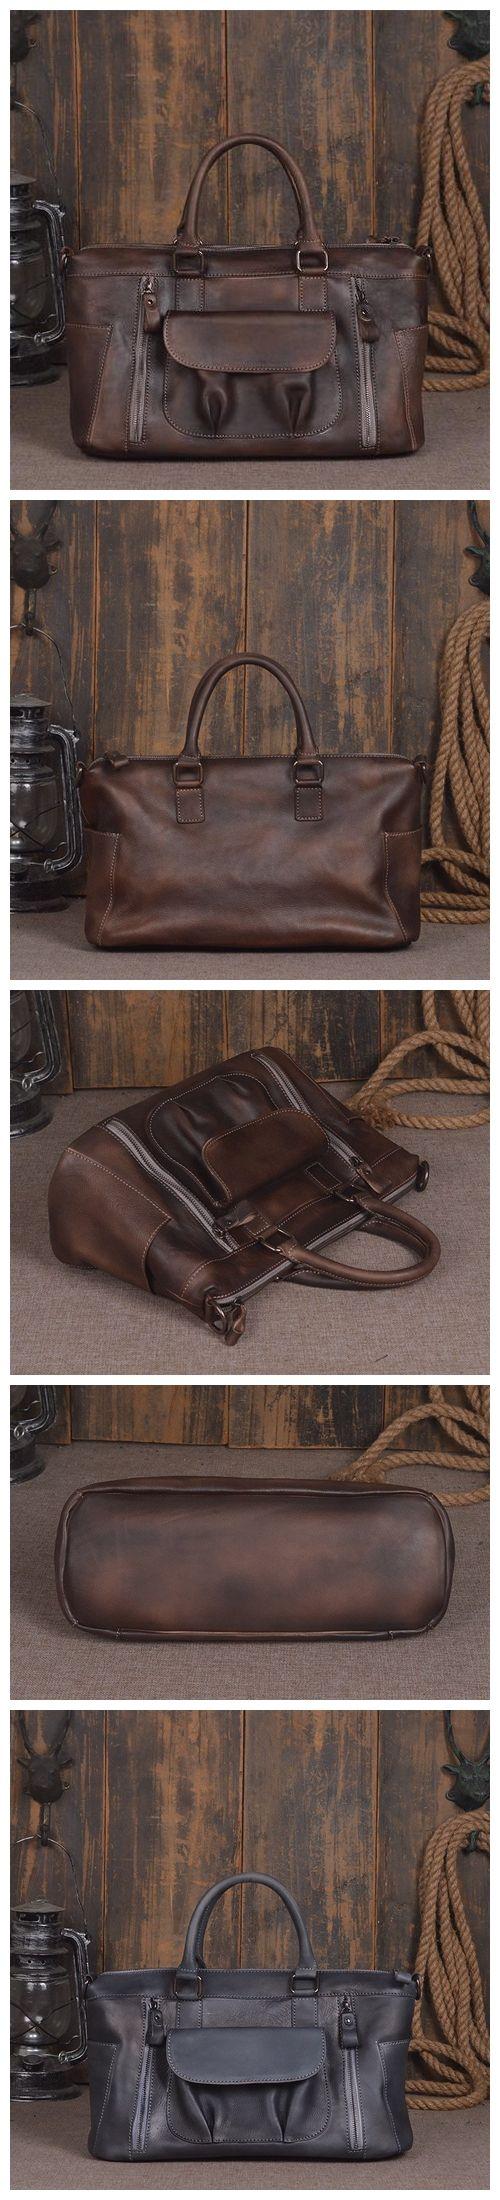 ROCKCOW World leather messenger bags for men women mens briefcase laptop bag best computer shoulder satchel school distressed bag 9014